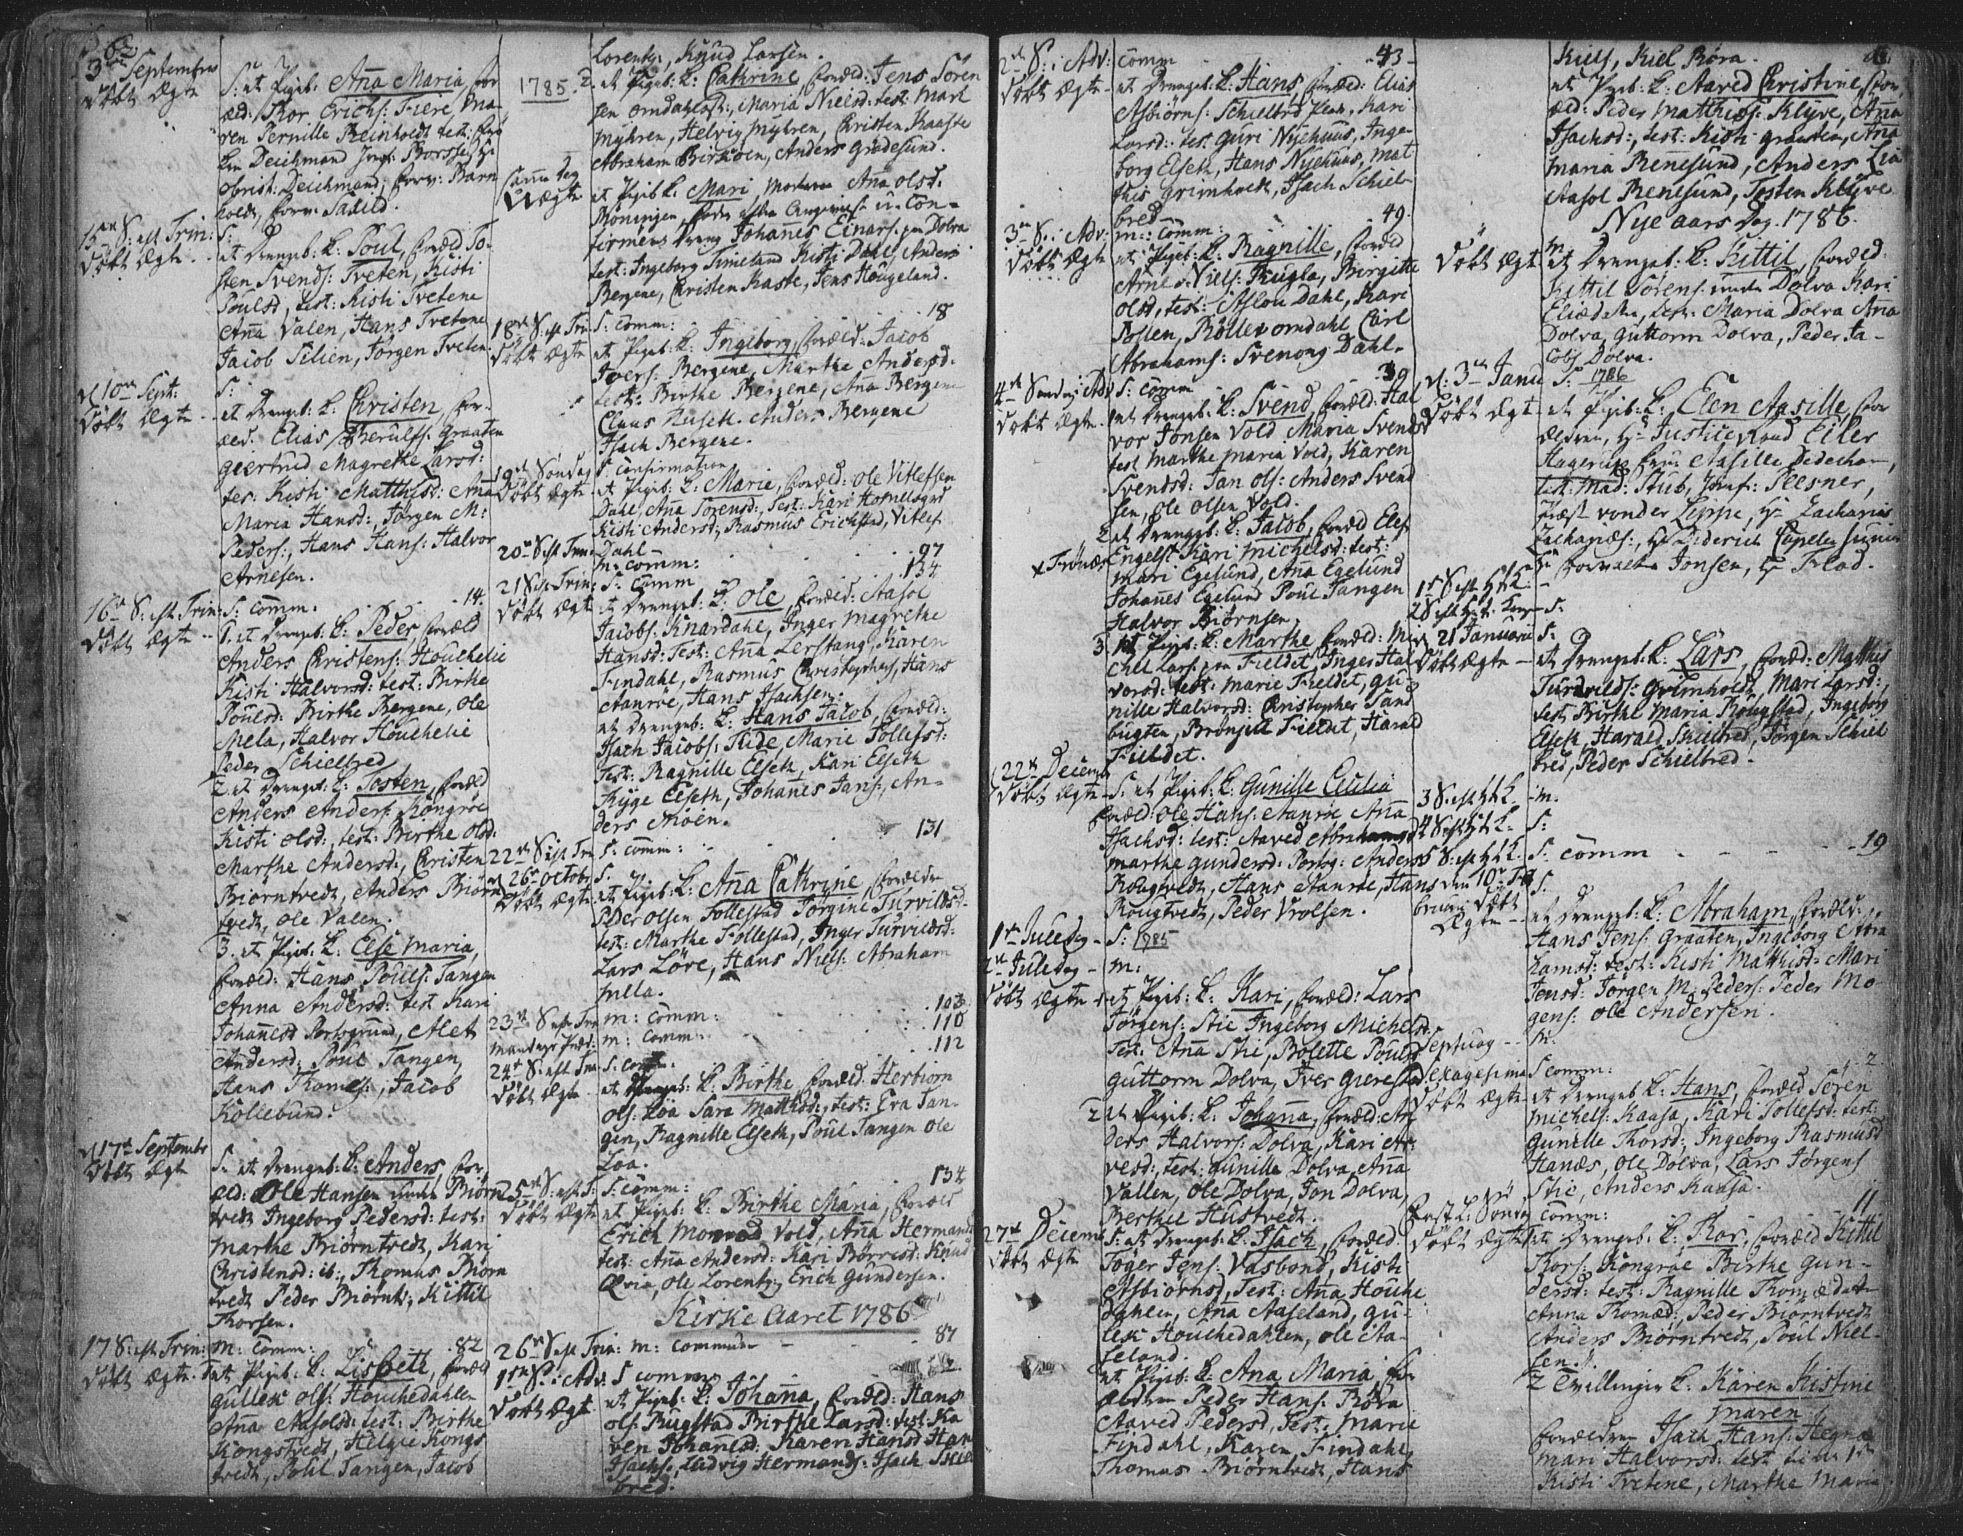 SAKO, Solum kirkebøker, F/Fa/L0003: Ministerialbok nr. I 3, 1761-1814, s. 62-63